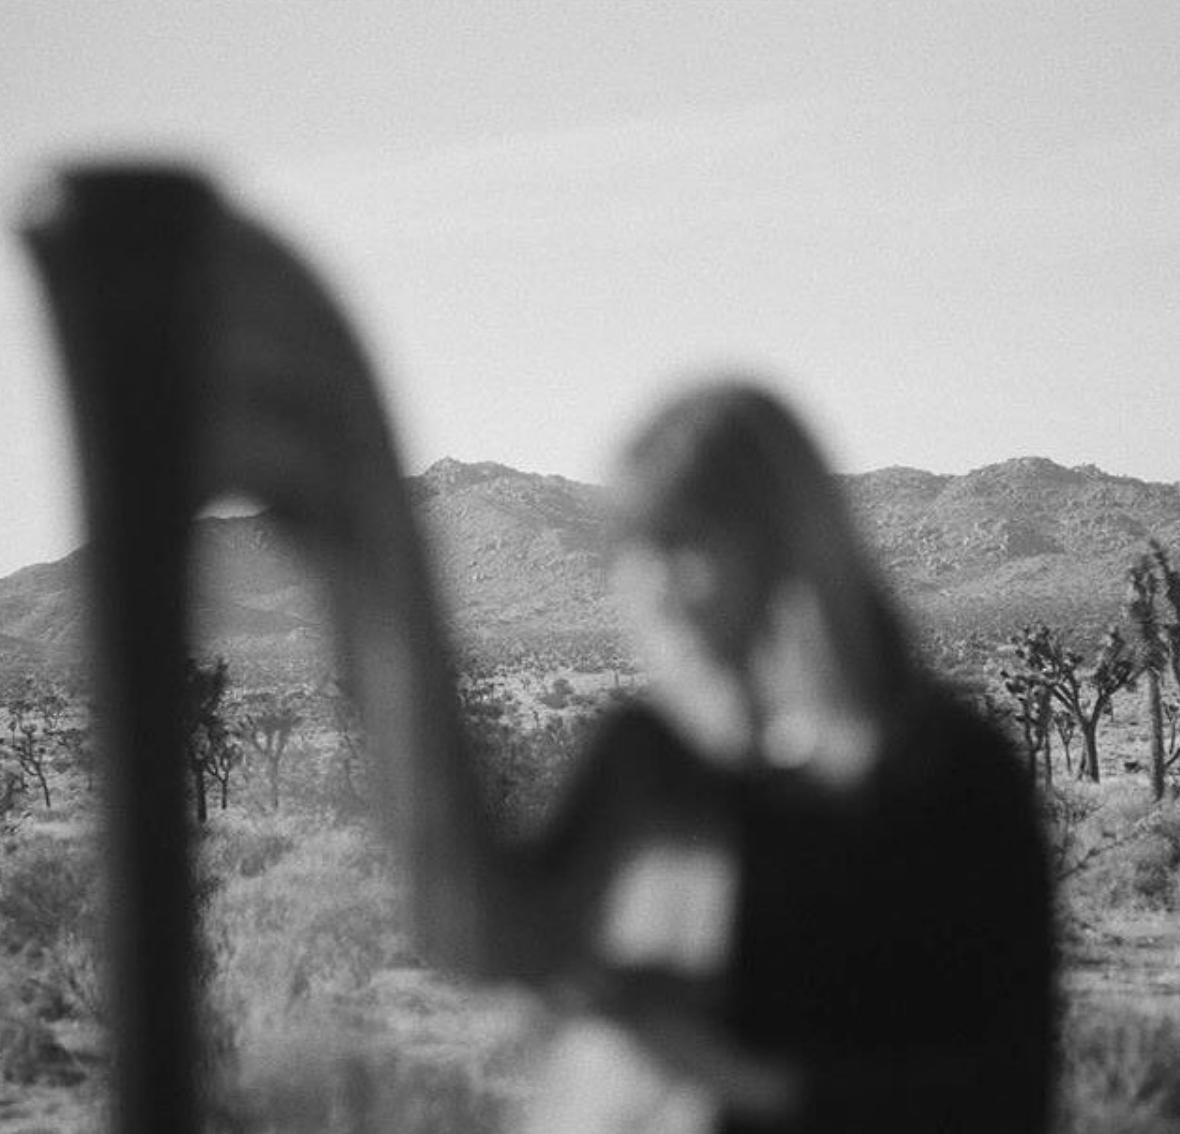 Mary + harp, photo by Rachael Pony Cassells